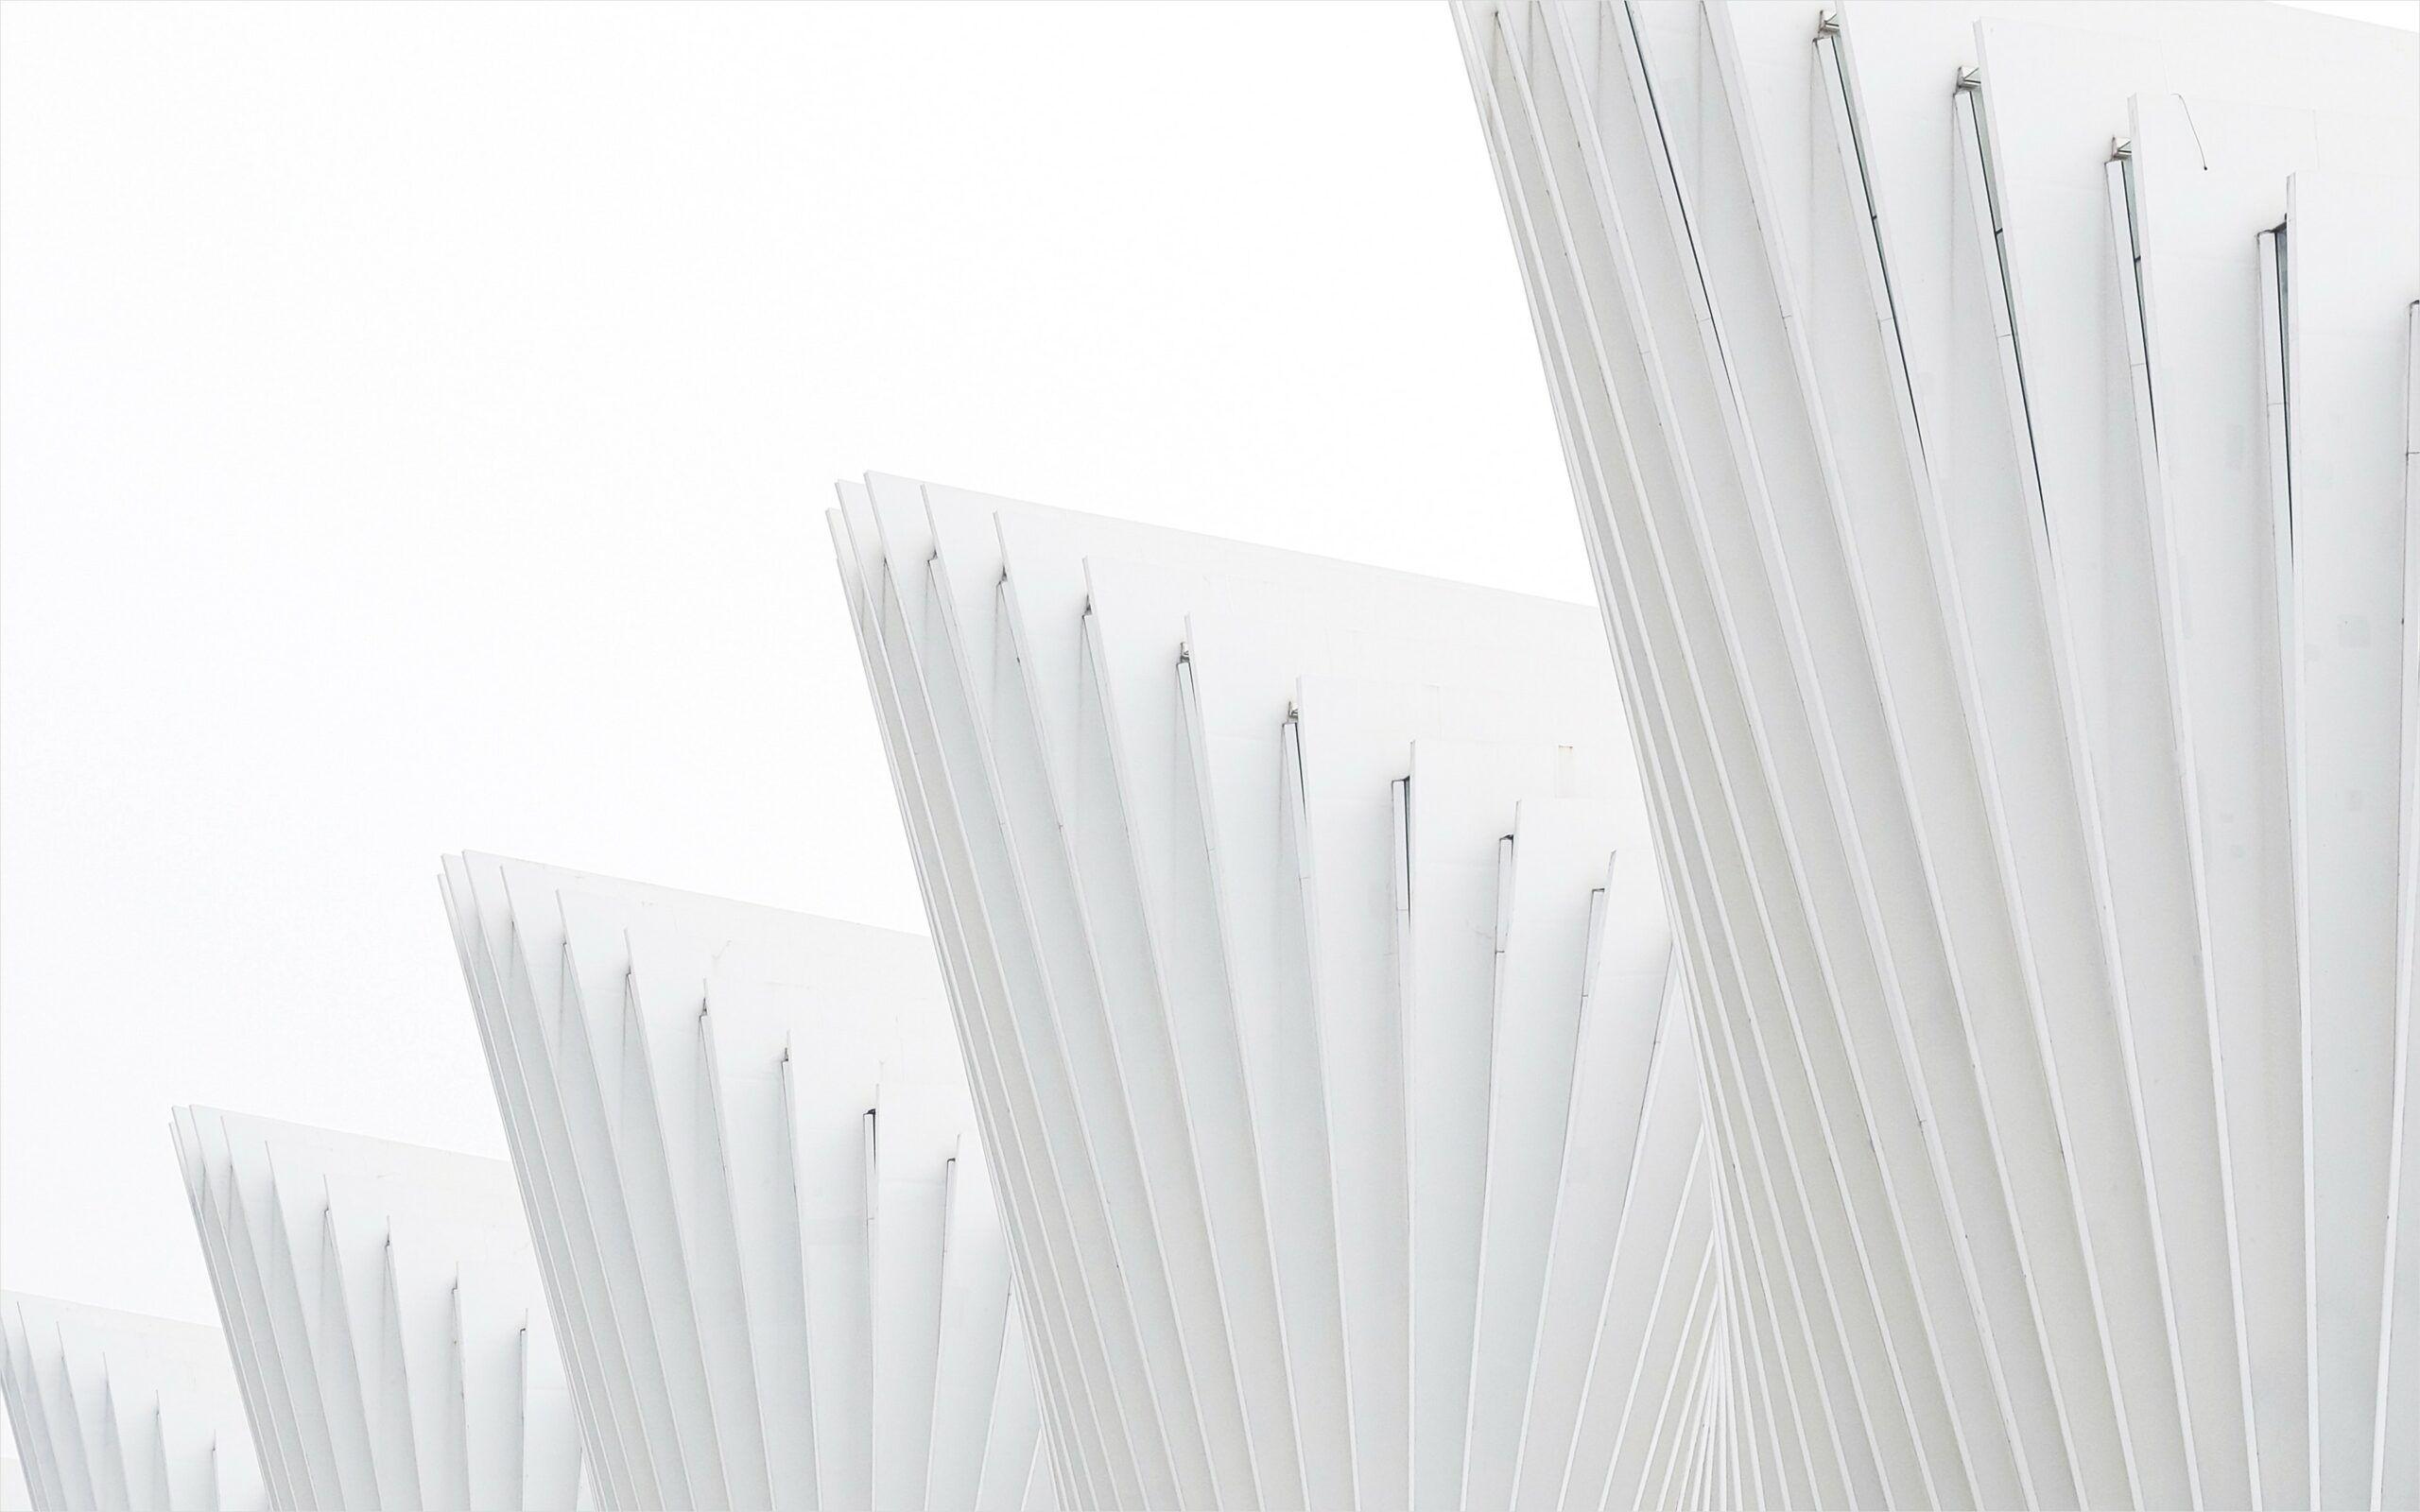 4k Wallpaper Simple White In 2020 White Pattern Background Wallpaper White Patterns